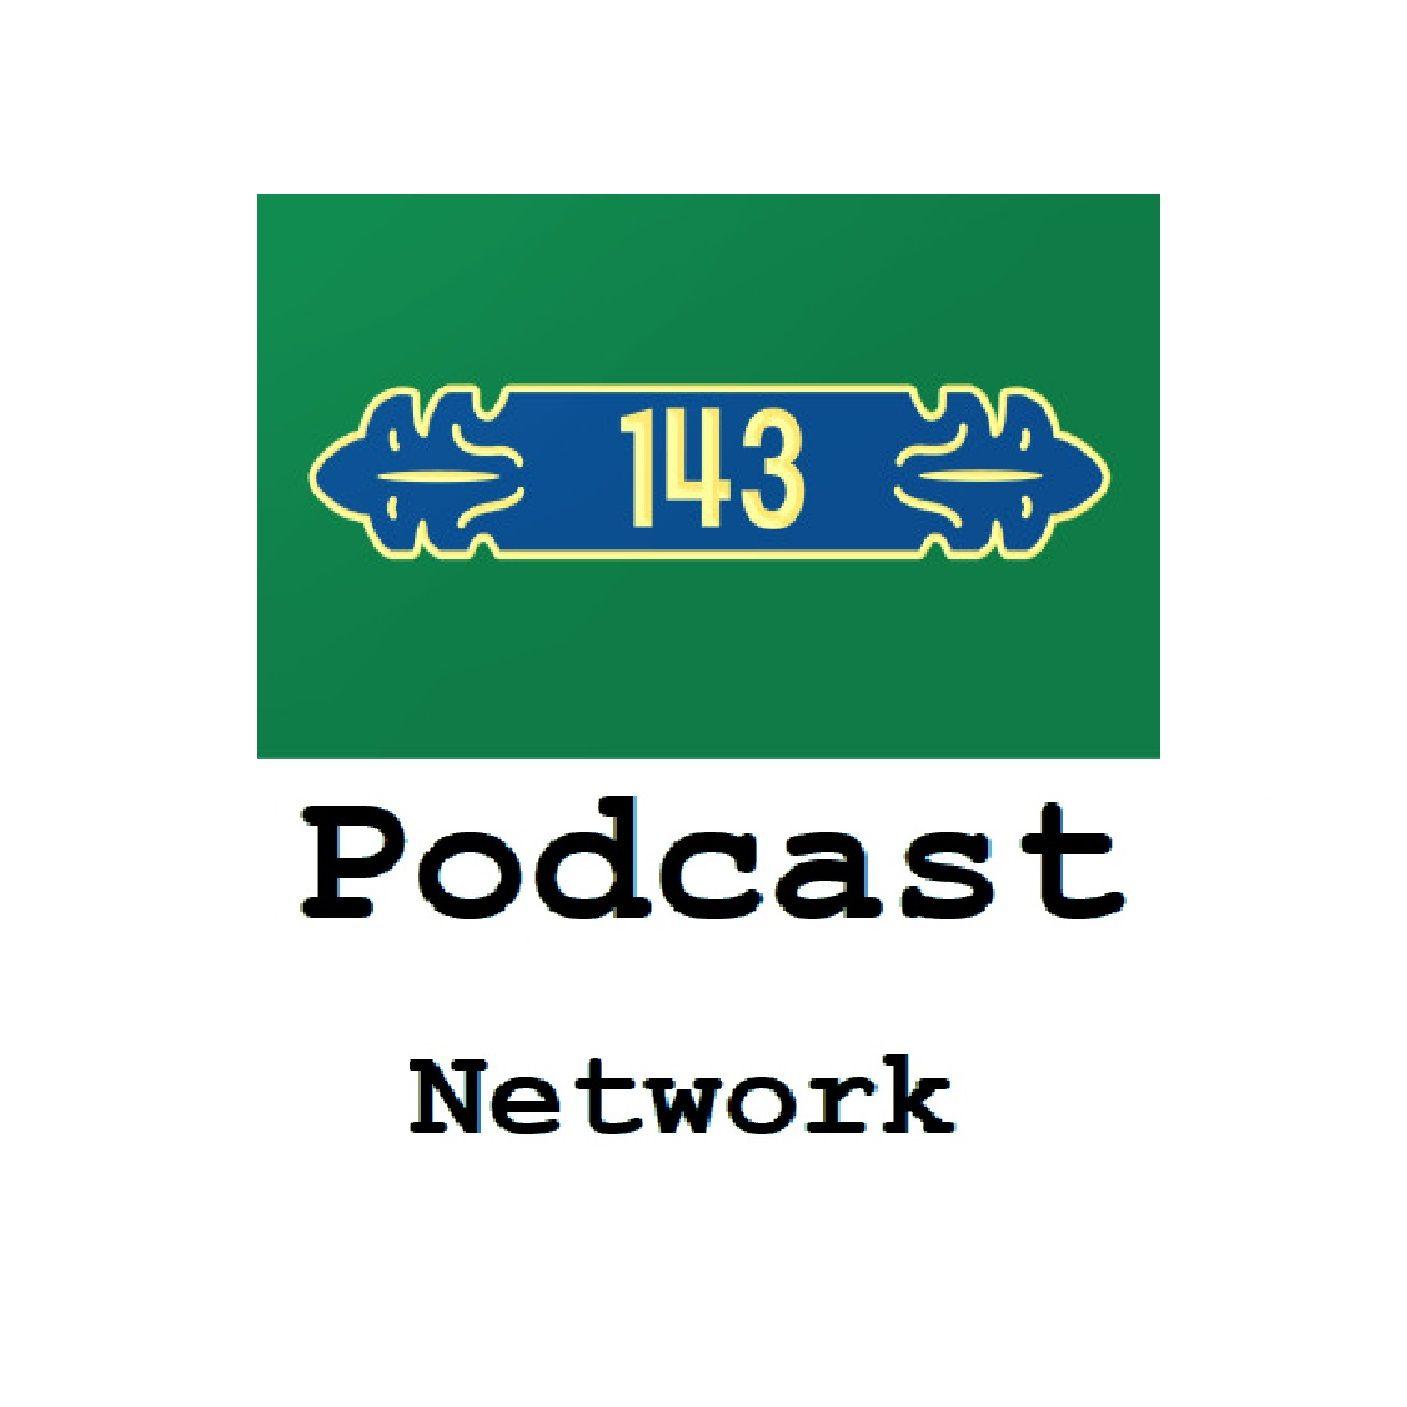 143 Network